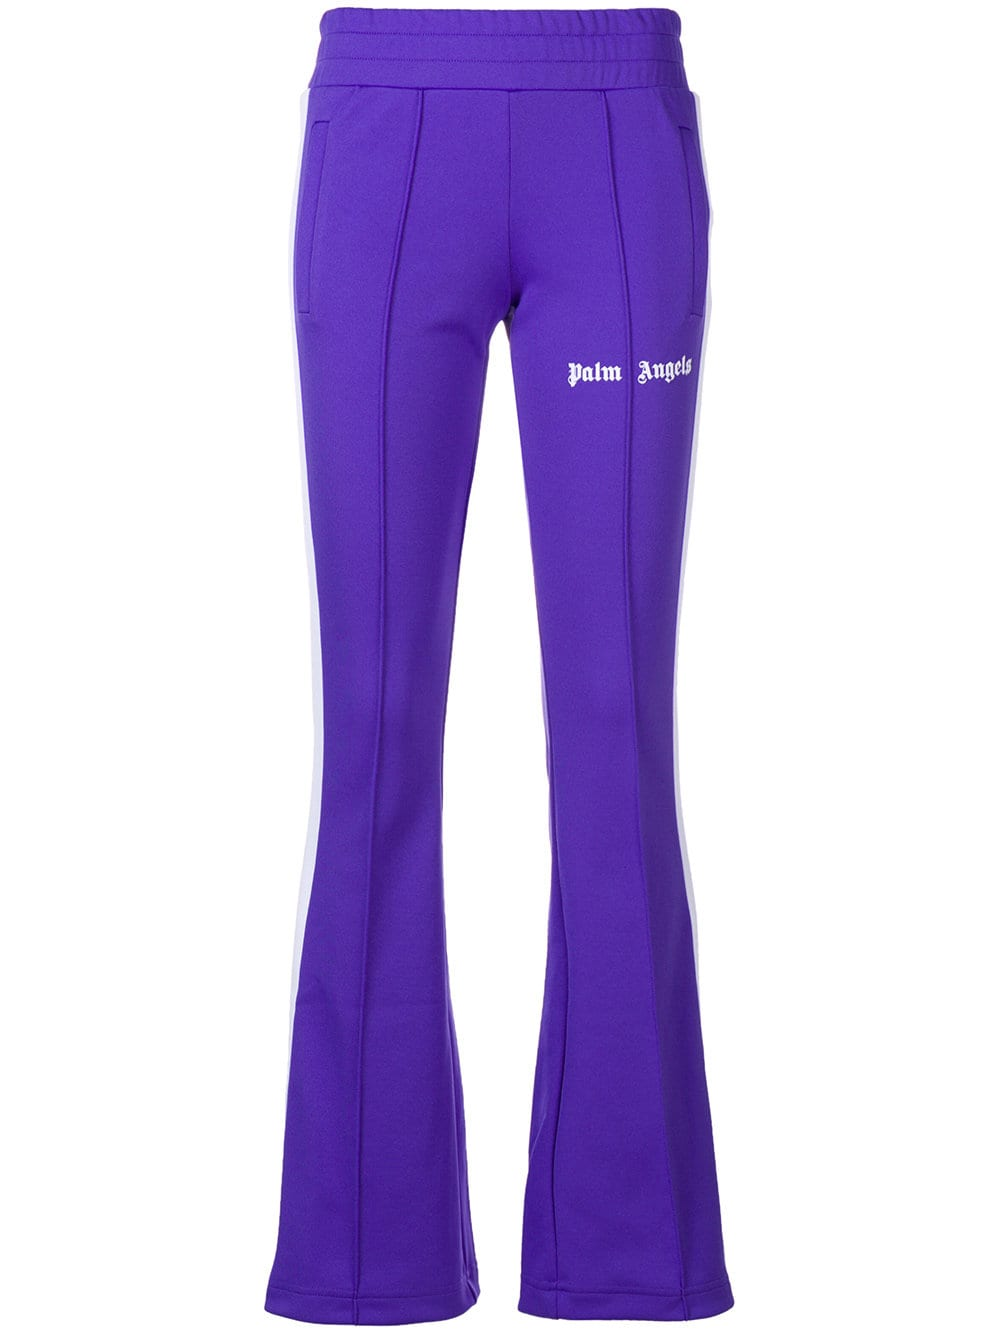 Palm Angels   Purple Track Pant